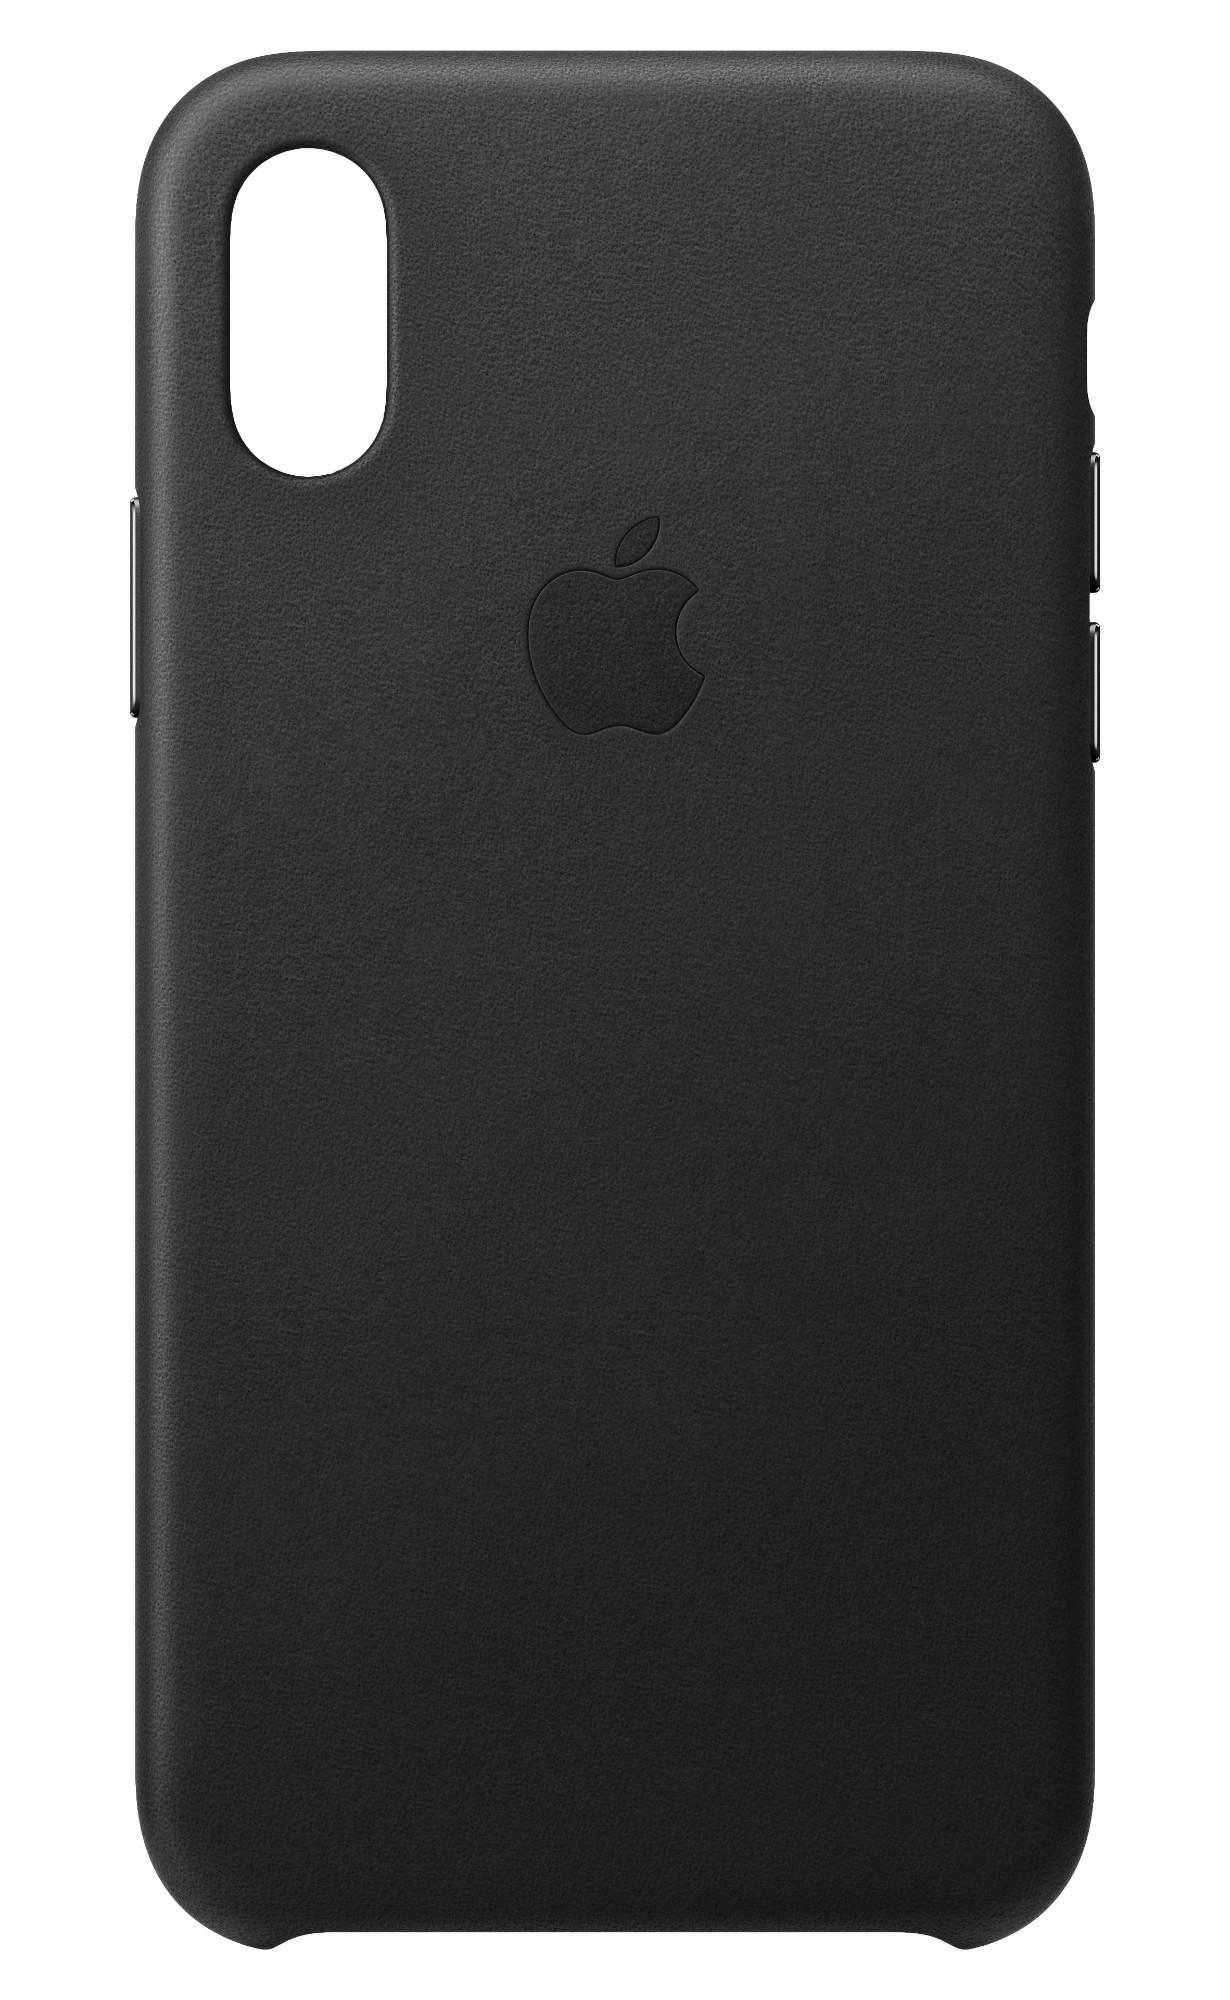 iPhone Xs - Leather Case - Black